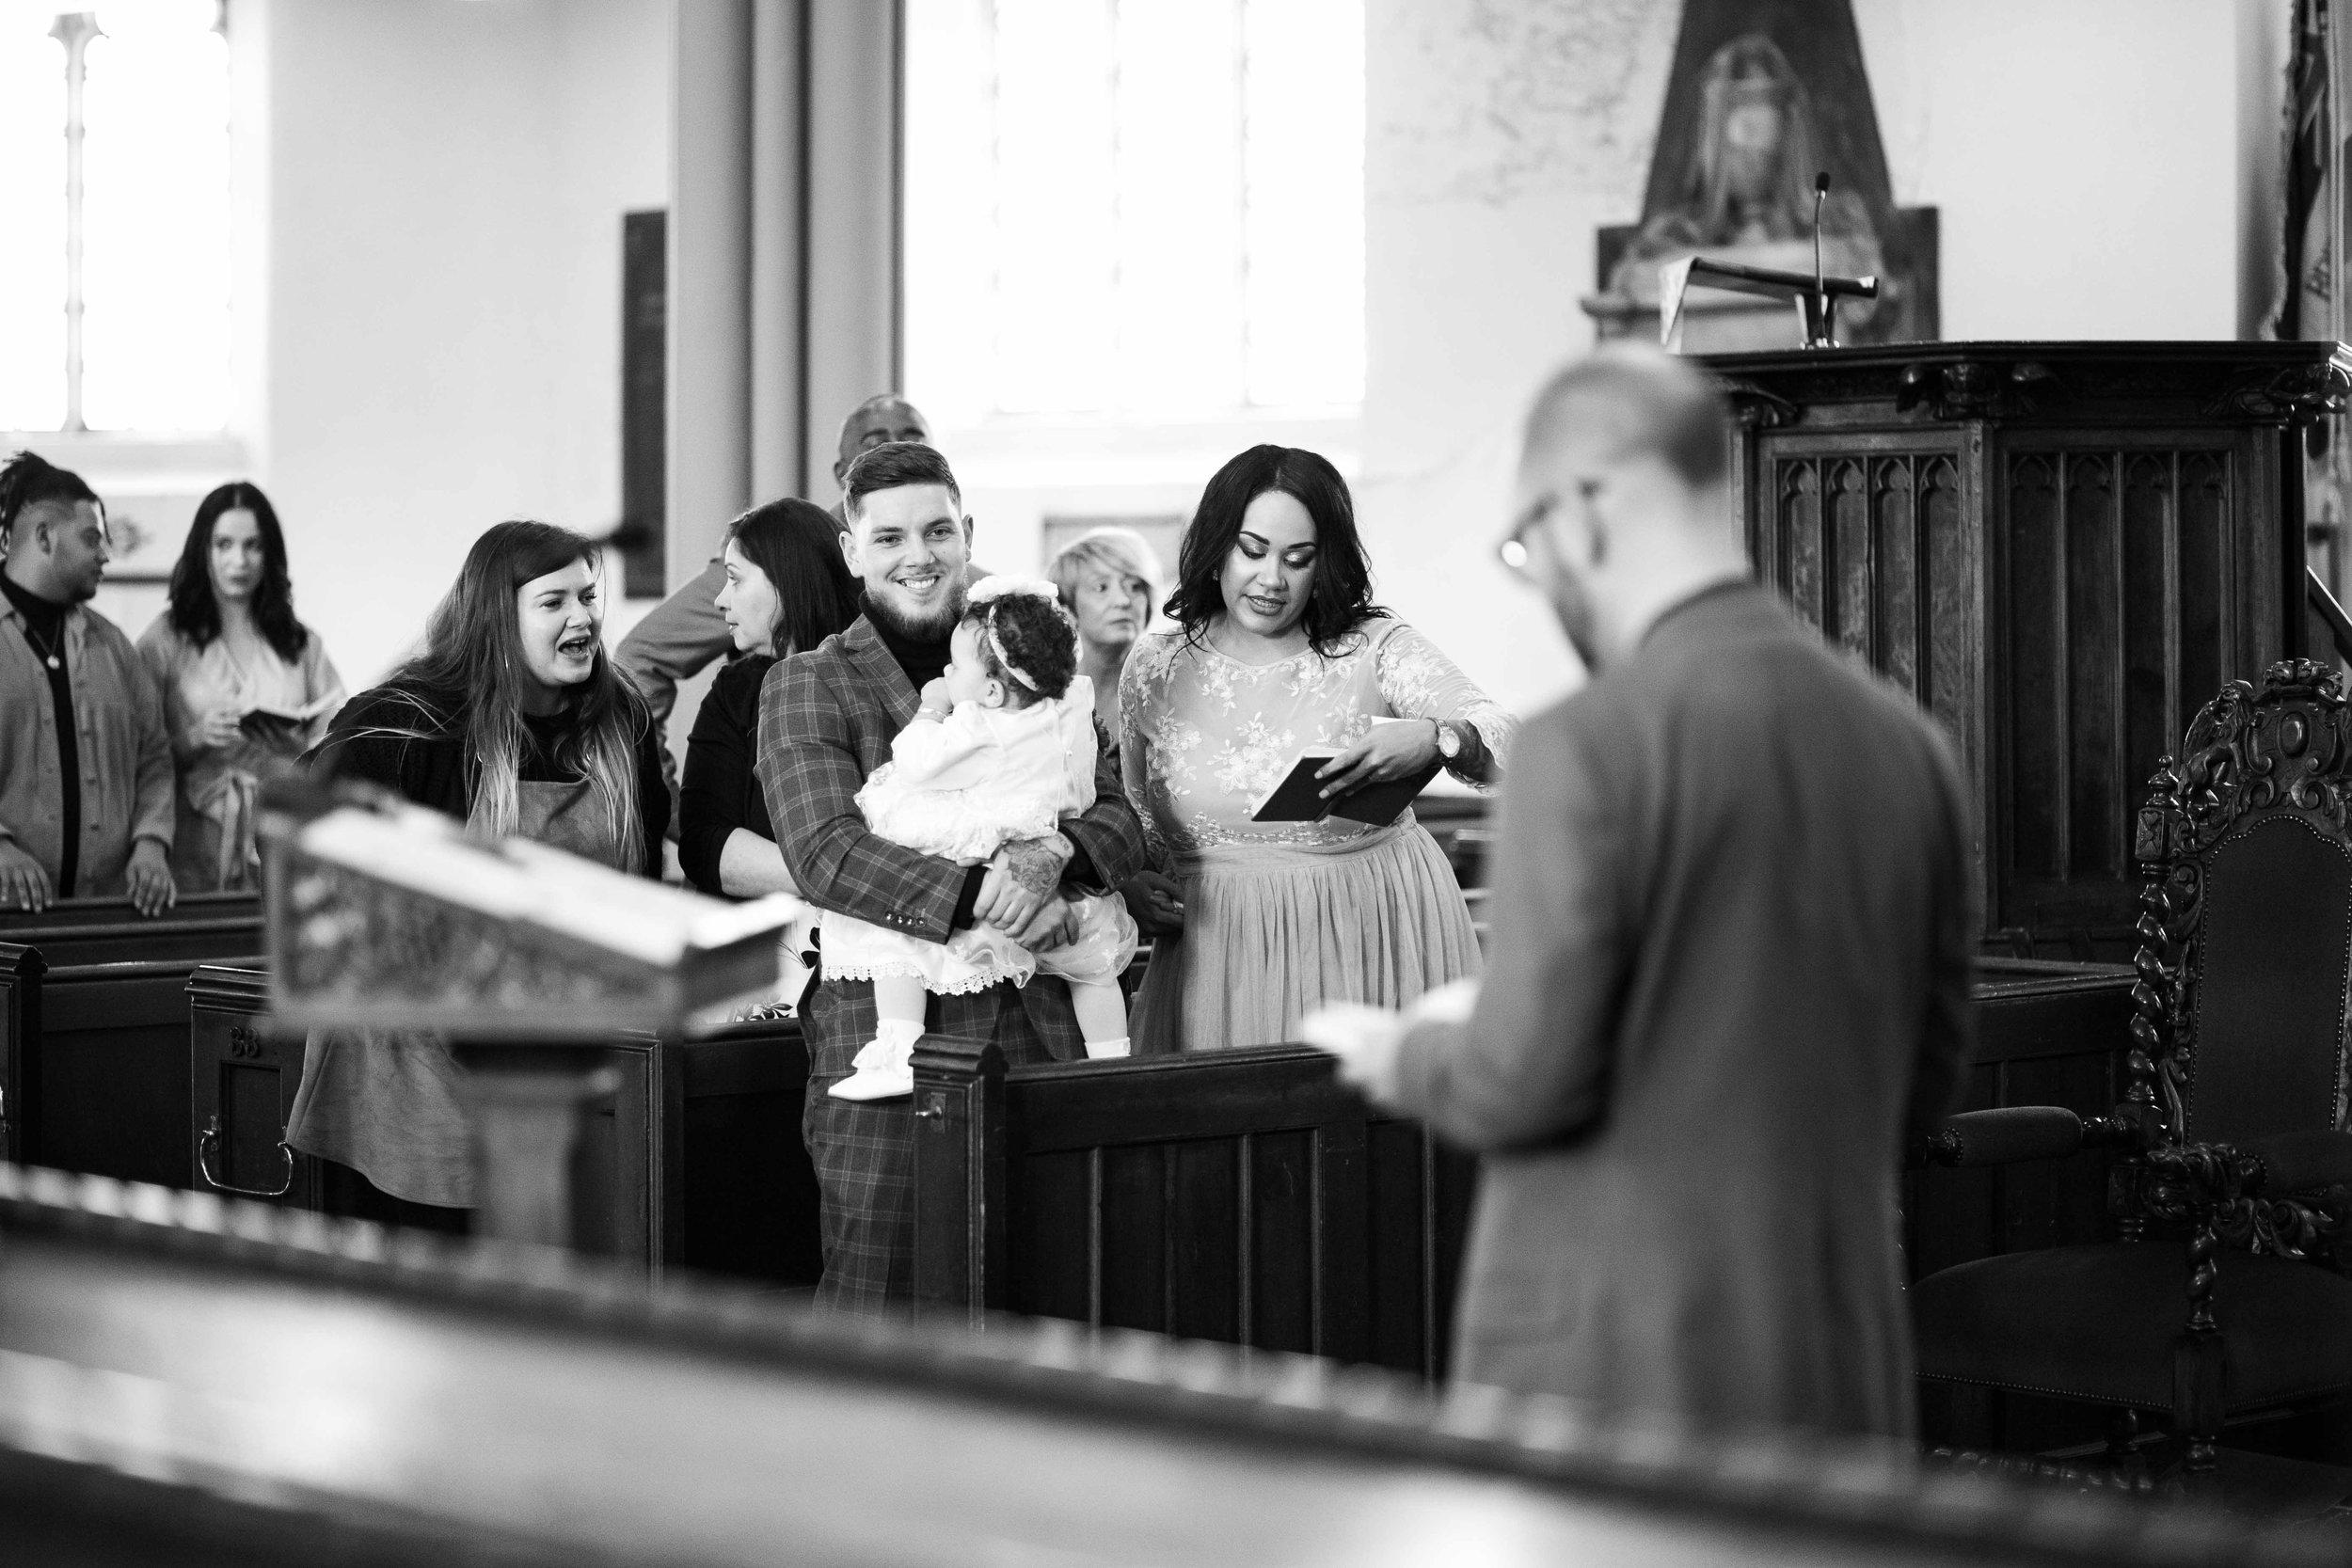 Lea-cooper-photography-christening-photographer-baptism-wolverhampton-wednesbury-walsall-willenhall-dudley-church-chapel-event-photography-9.jpg